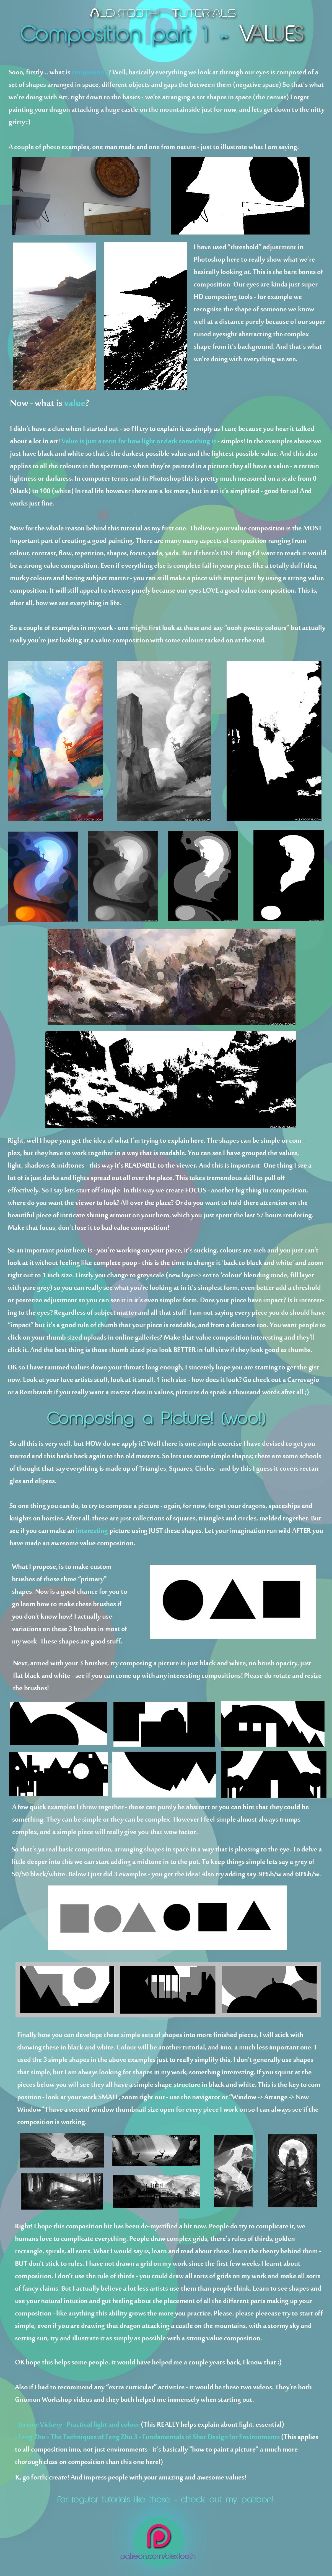 Alextooth - Composition part 1 - Values